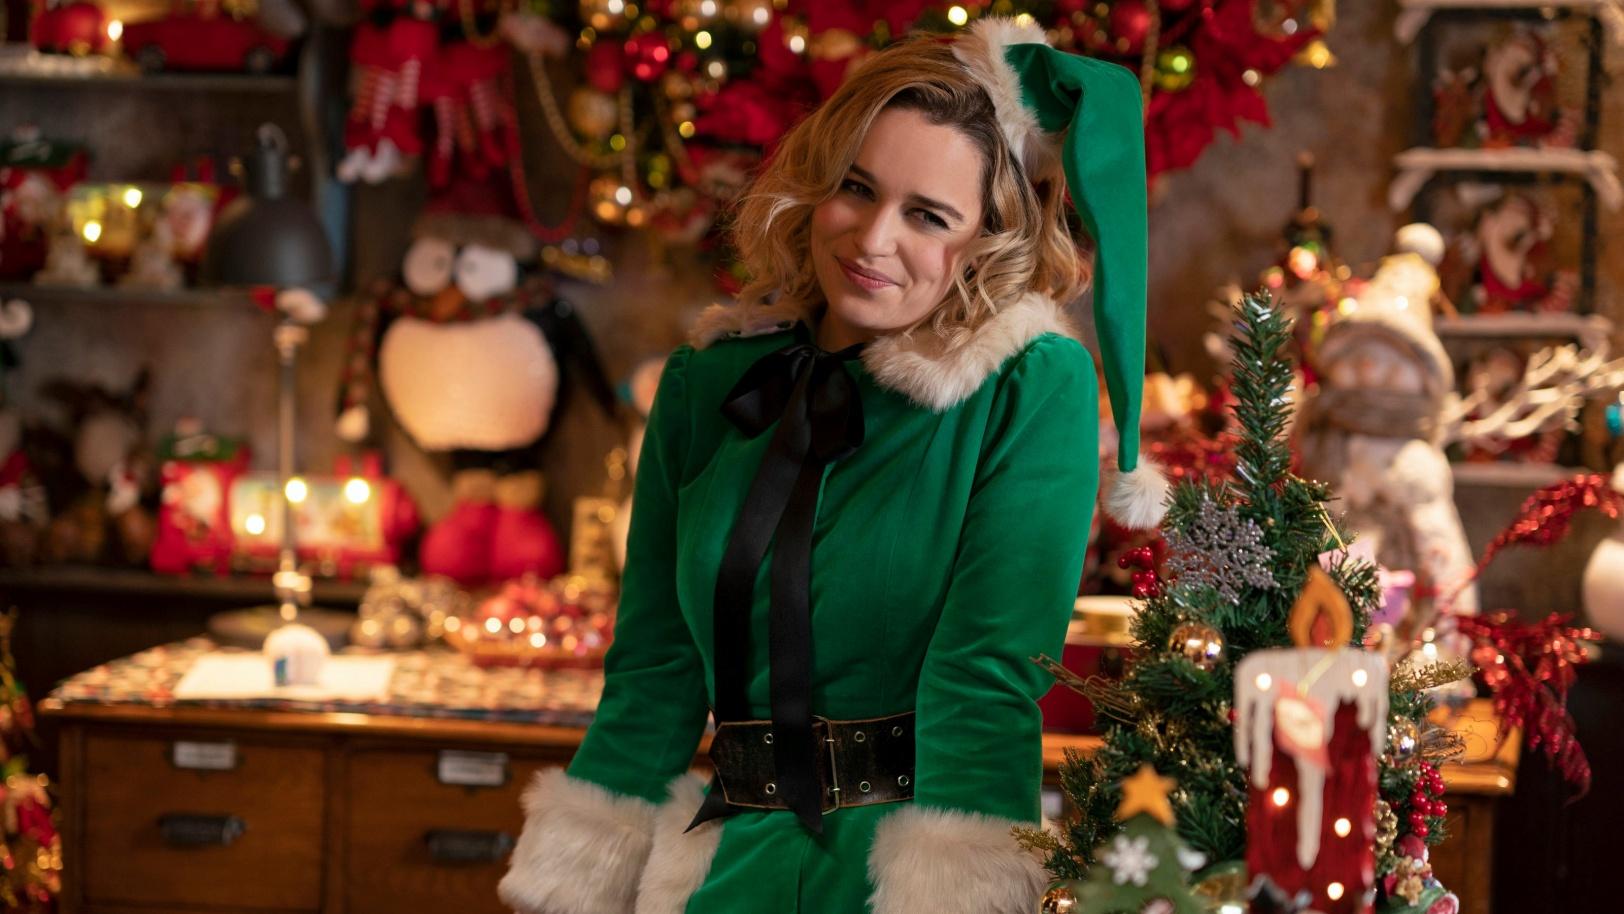 https://elle.ua/upload/image/last_christmas_anteprima_moviedigger.jpg